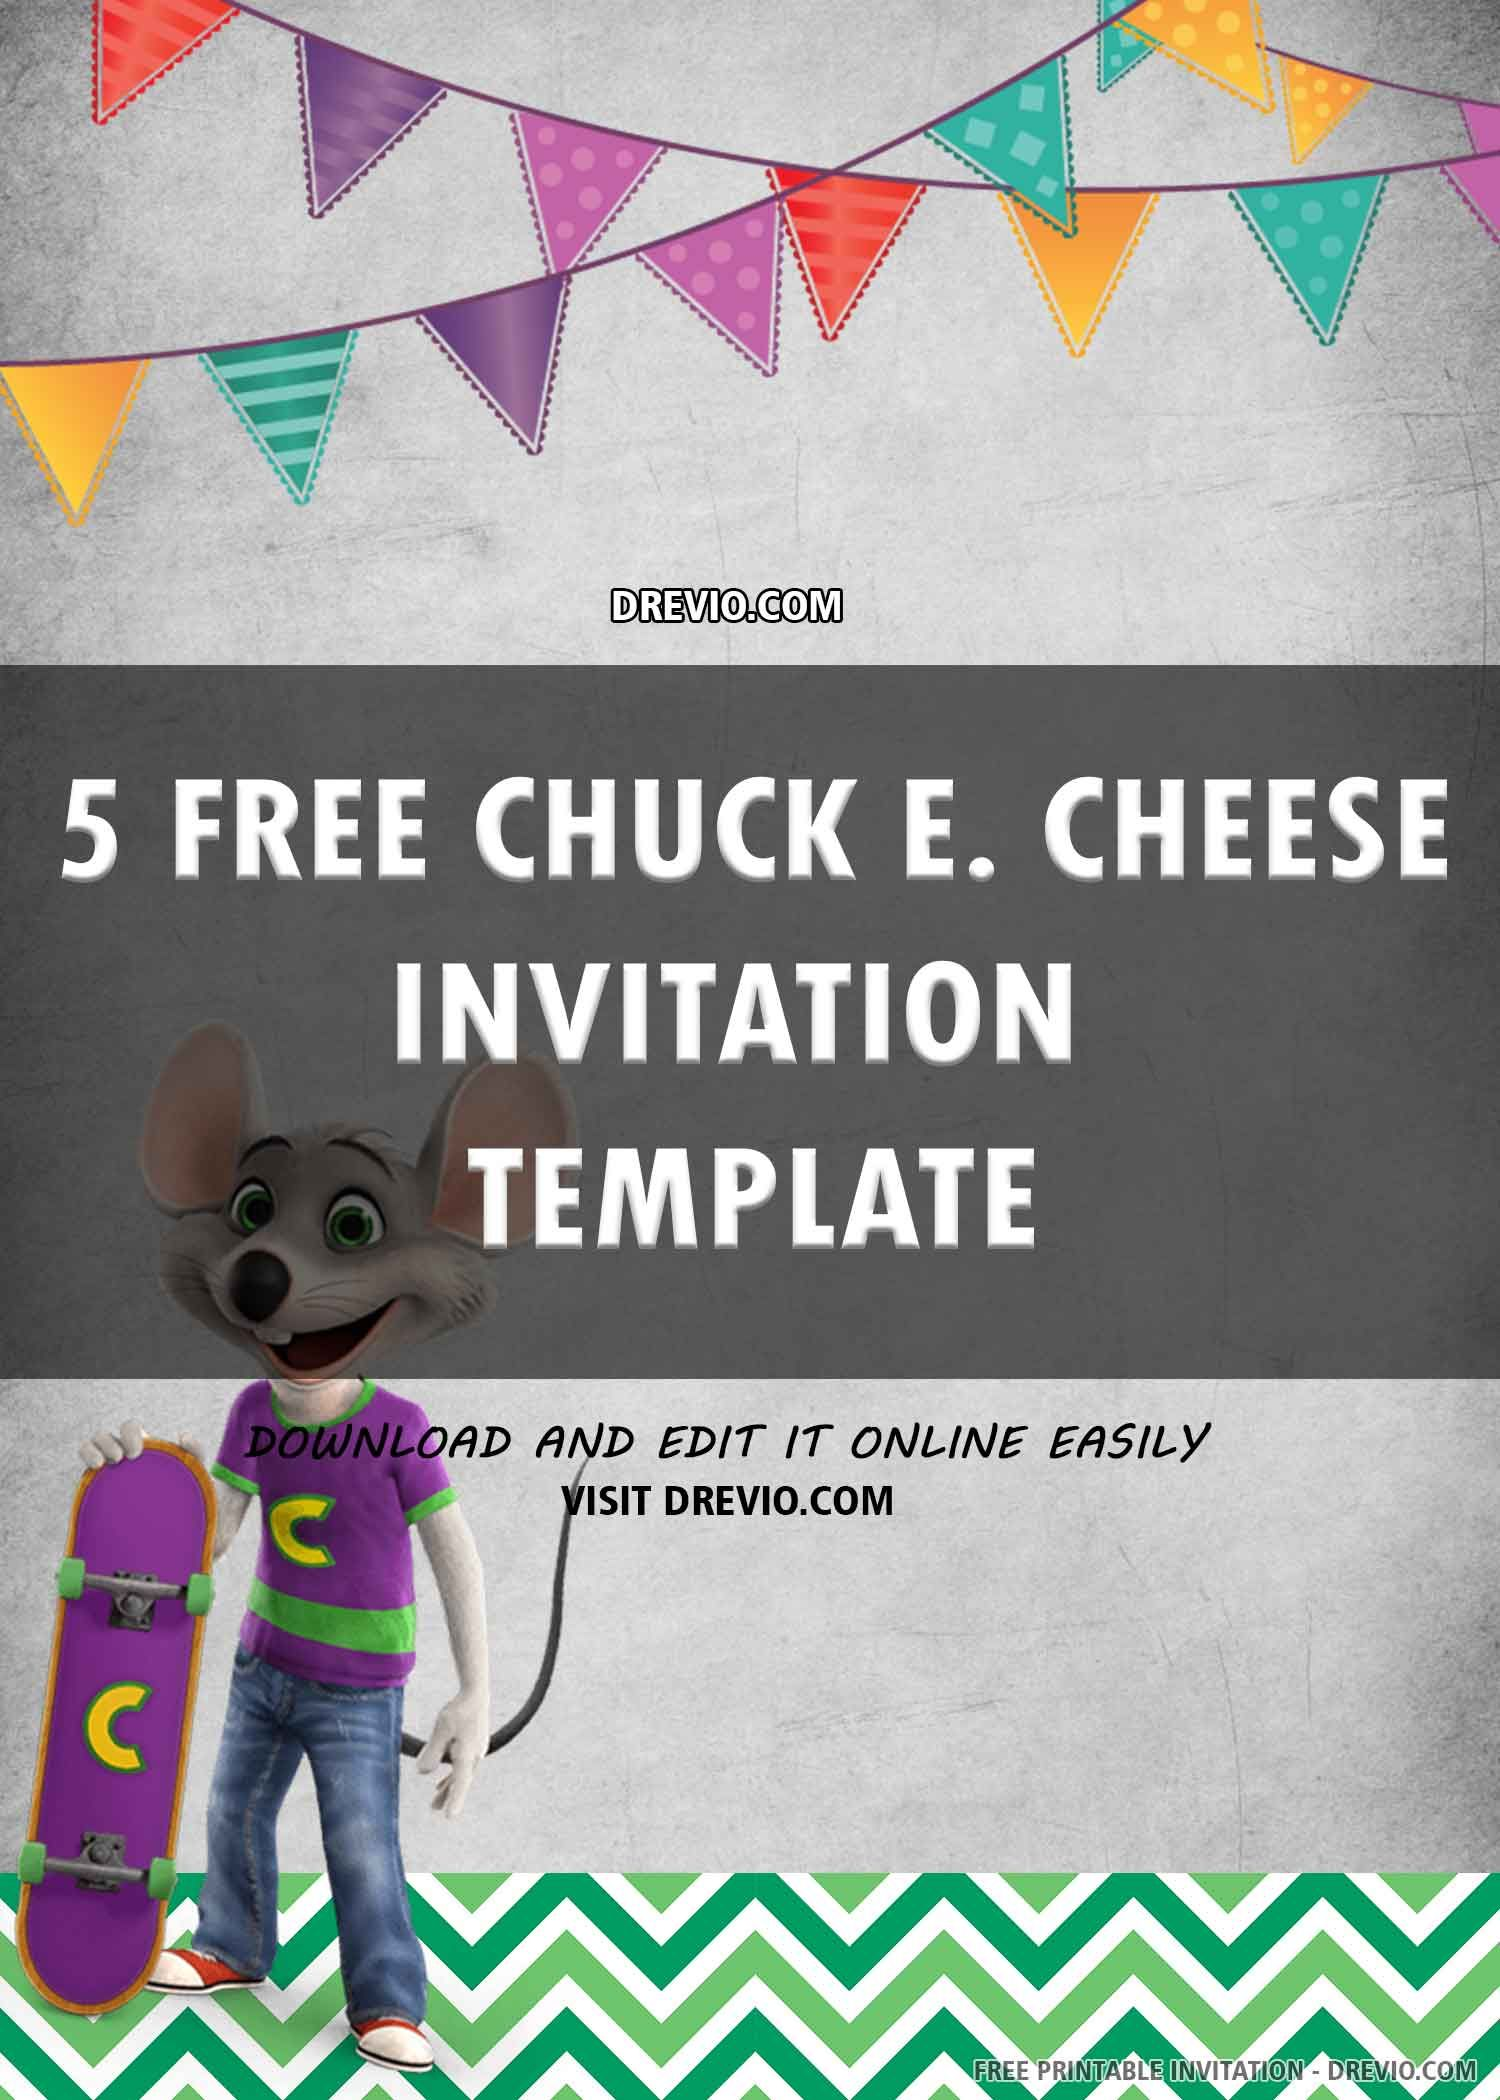 Free Printable Chuck E Cheese Birthday Invitation Template In 2021 Free Printable Birthday Invitations Birthday Invitation Templates Chuck E Cheese Birthday